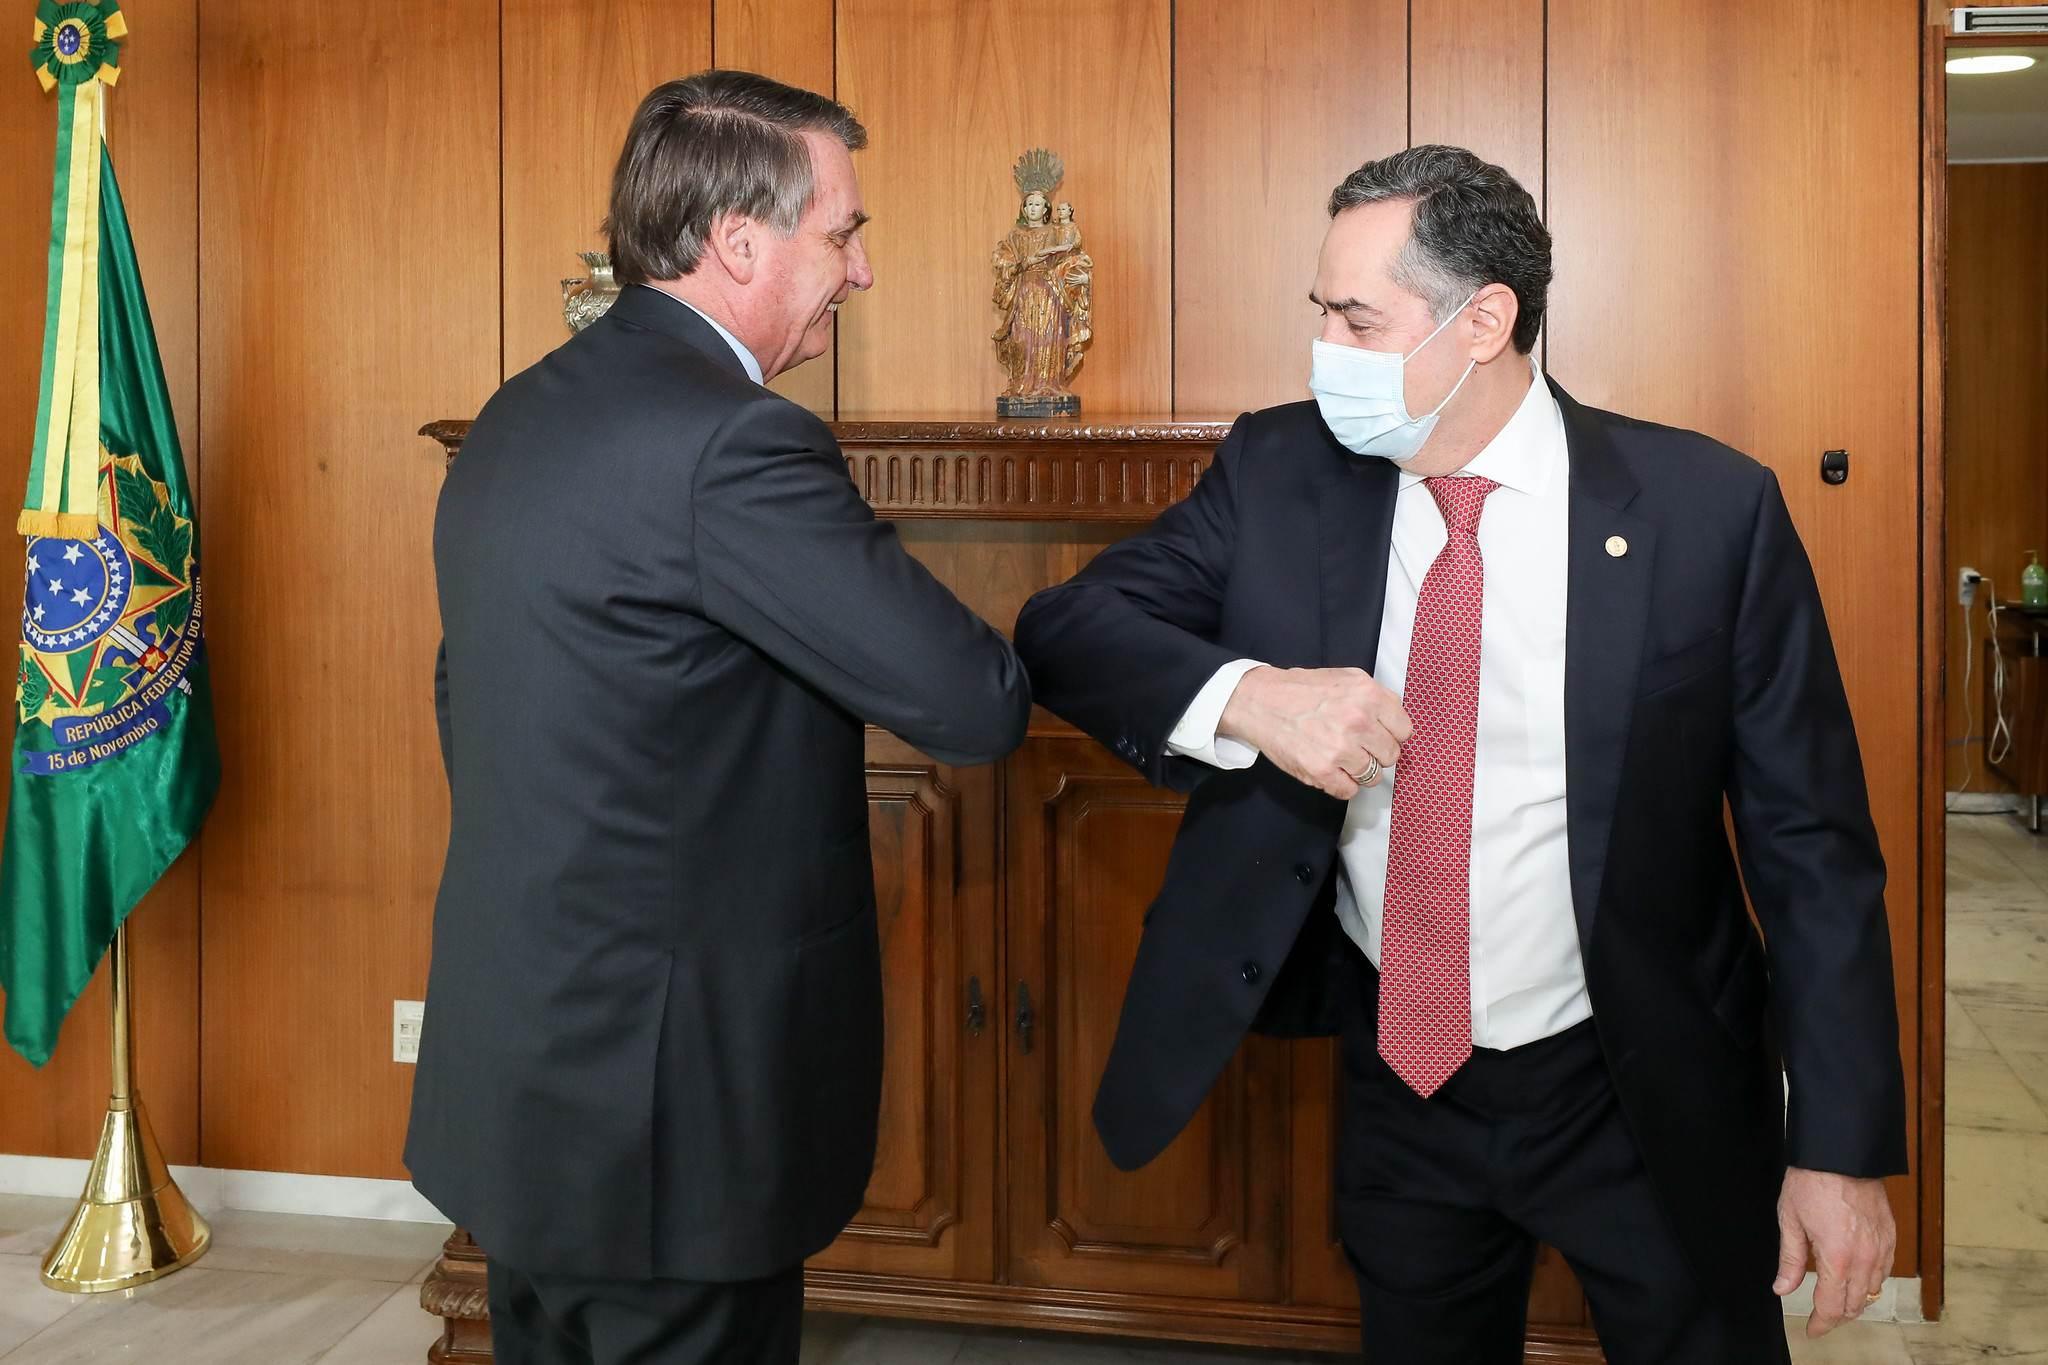 Ministro do STF Luís Roberto Barroso e Jair Bolsonaro se cumprimentam